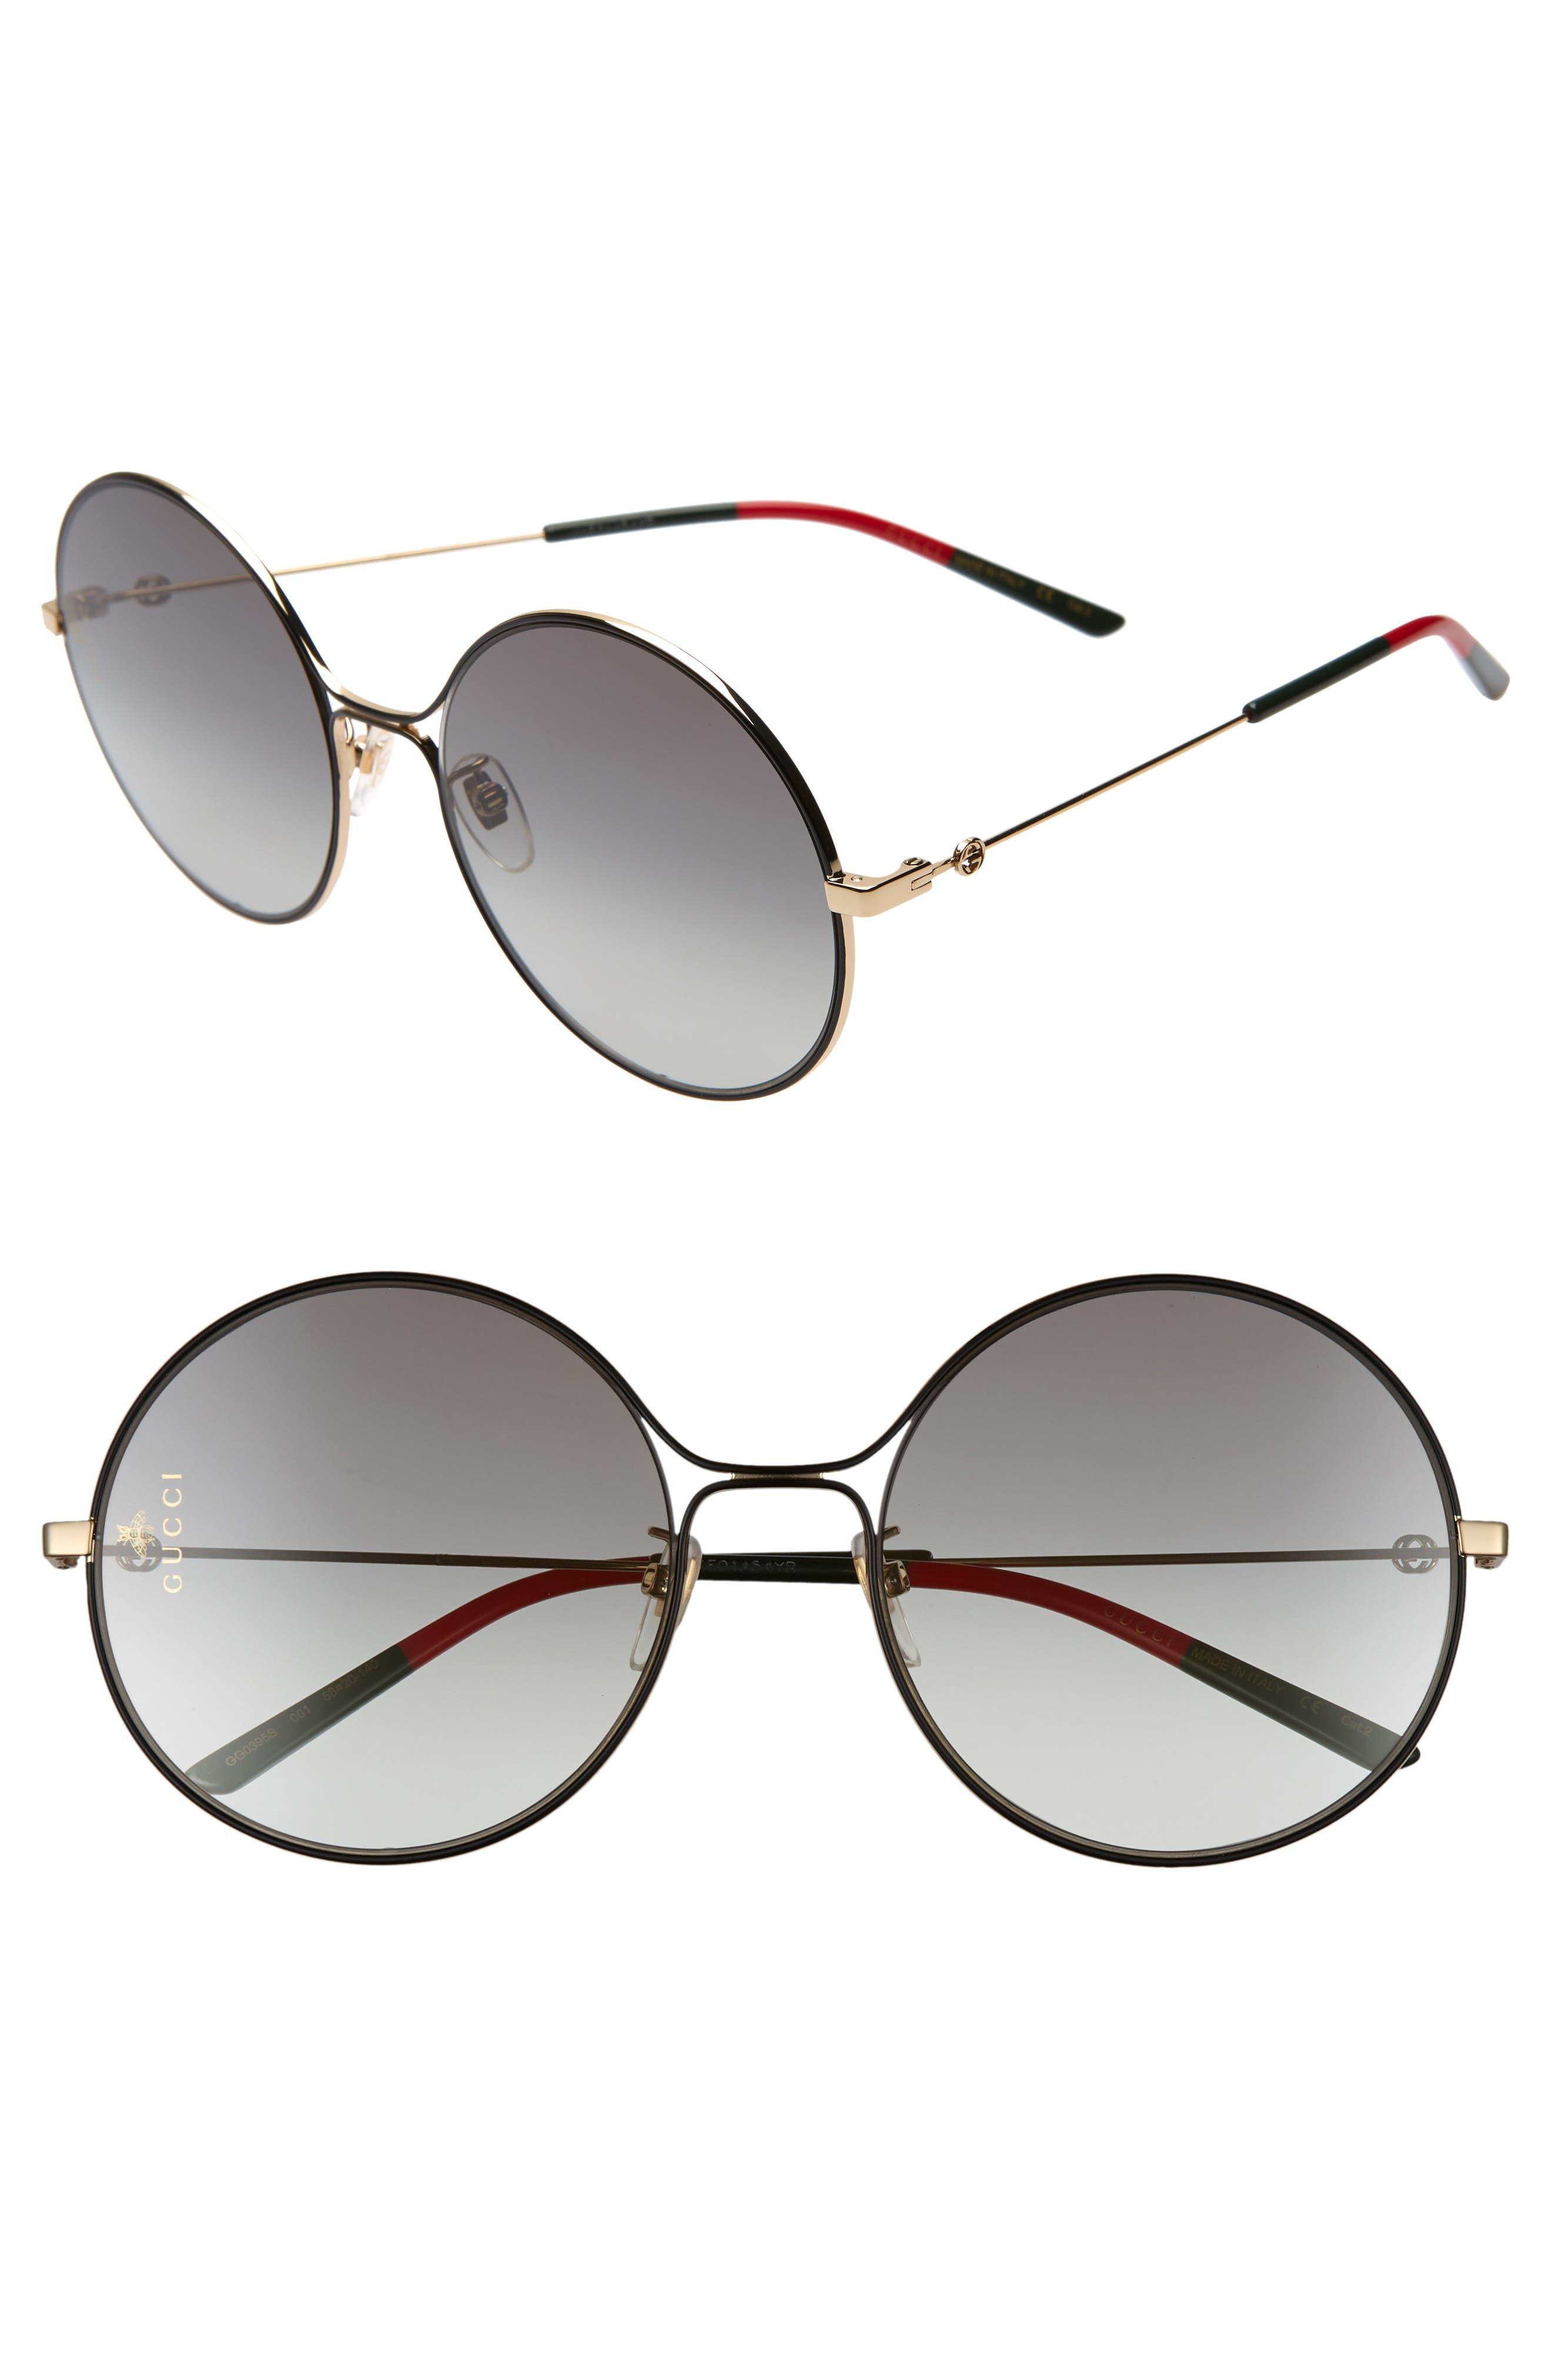 58mm Round Sunglasses,                             Main thumbnail 1, color,                             GOLD/ BLACK/ GREY GRADIENT